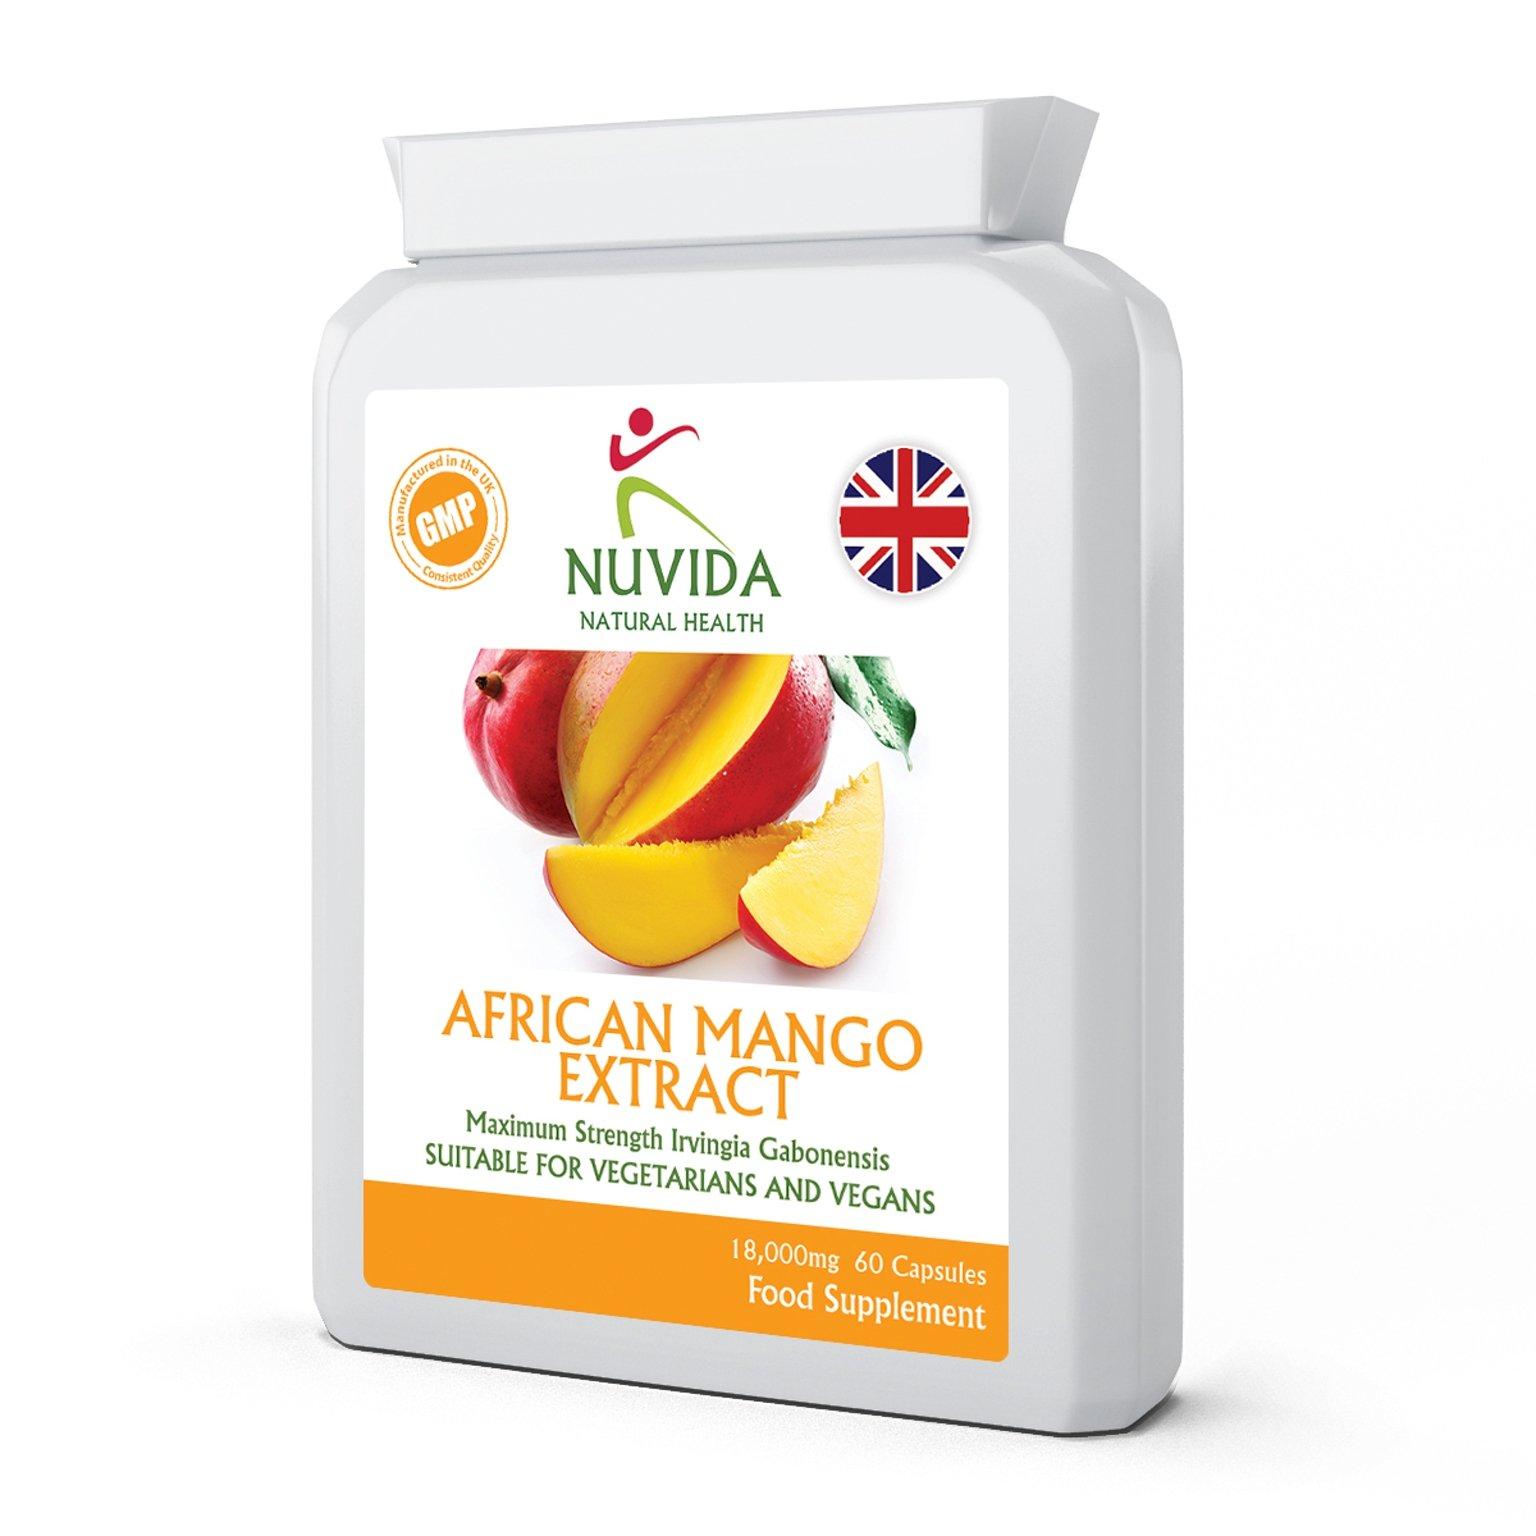 Pure African Mango Capsules / 60 High Strength 18,000mg African Mango Extract Capsules/High in Dietary Fibre/Vegan and Vegetarian Friendly